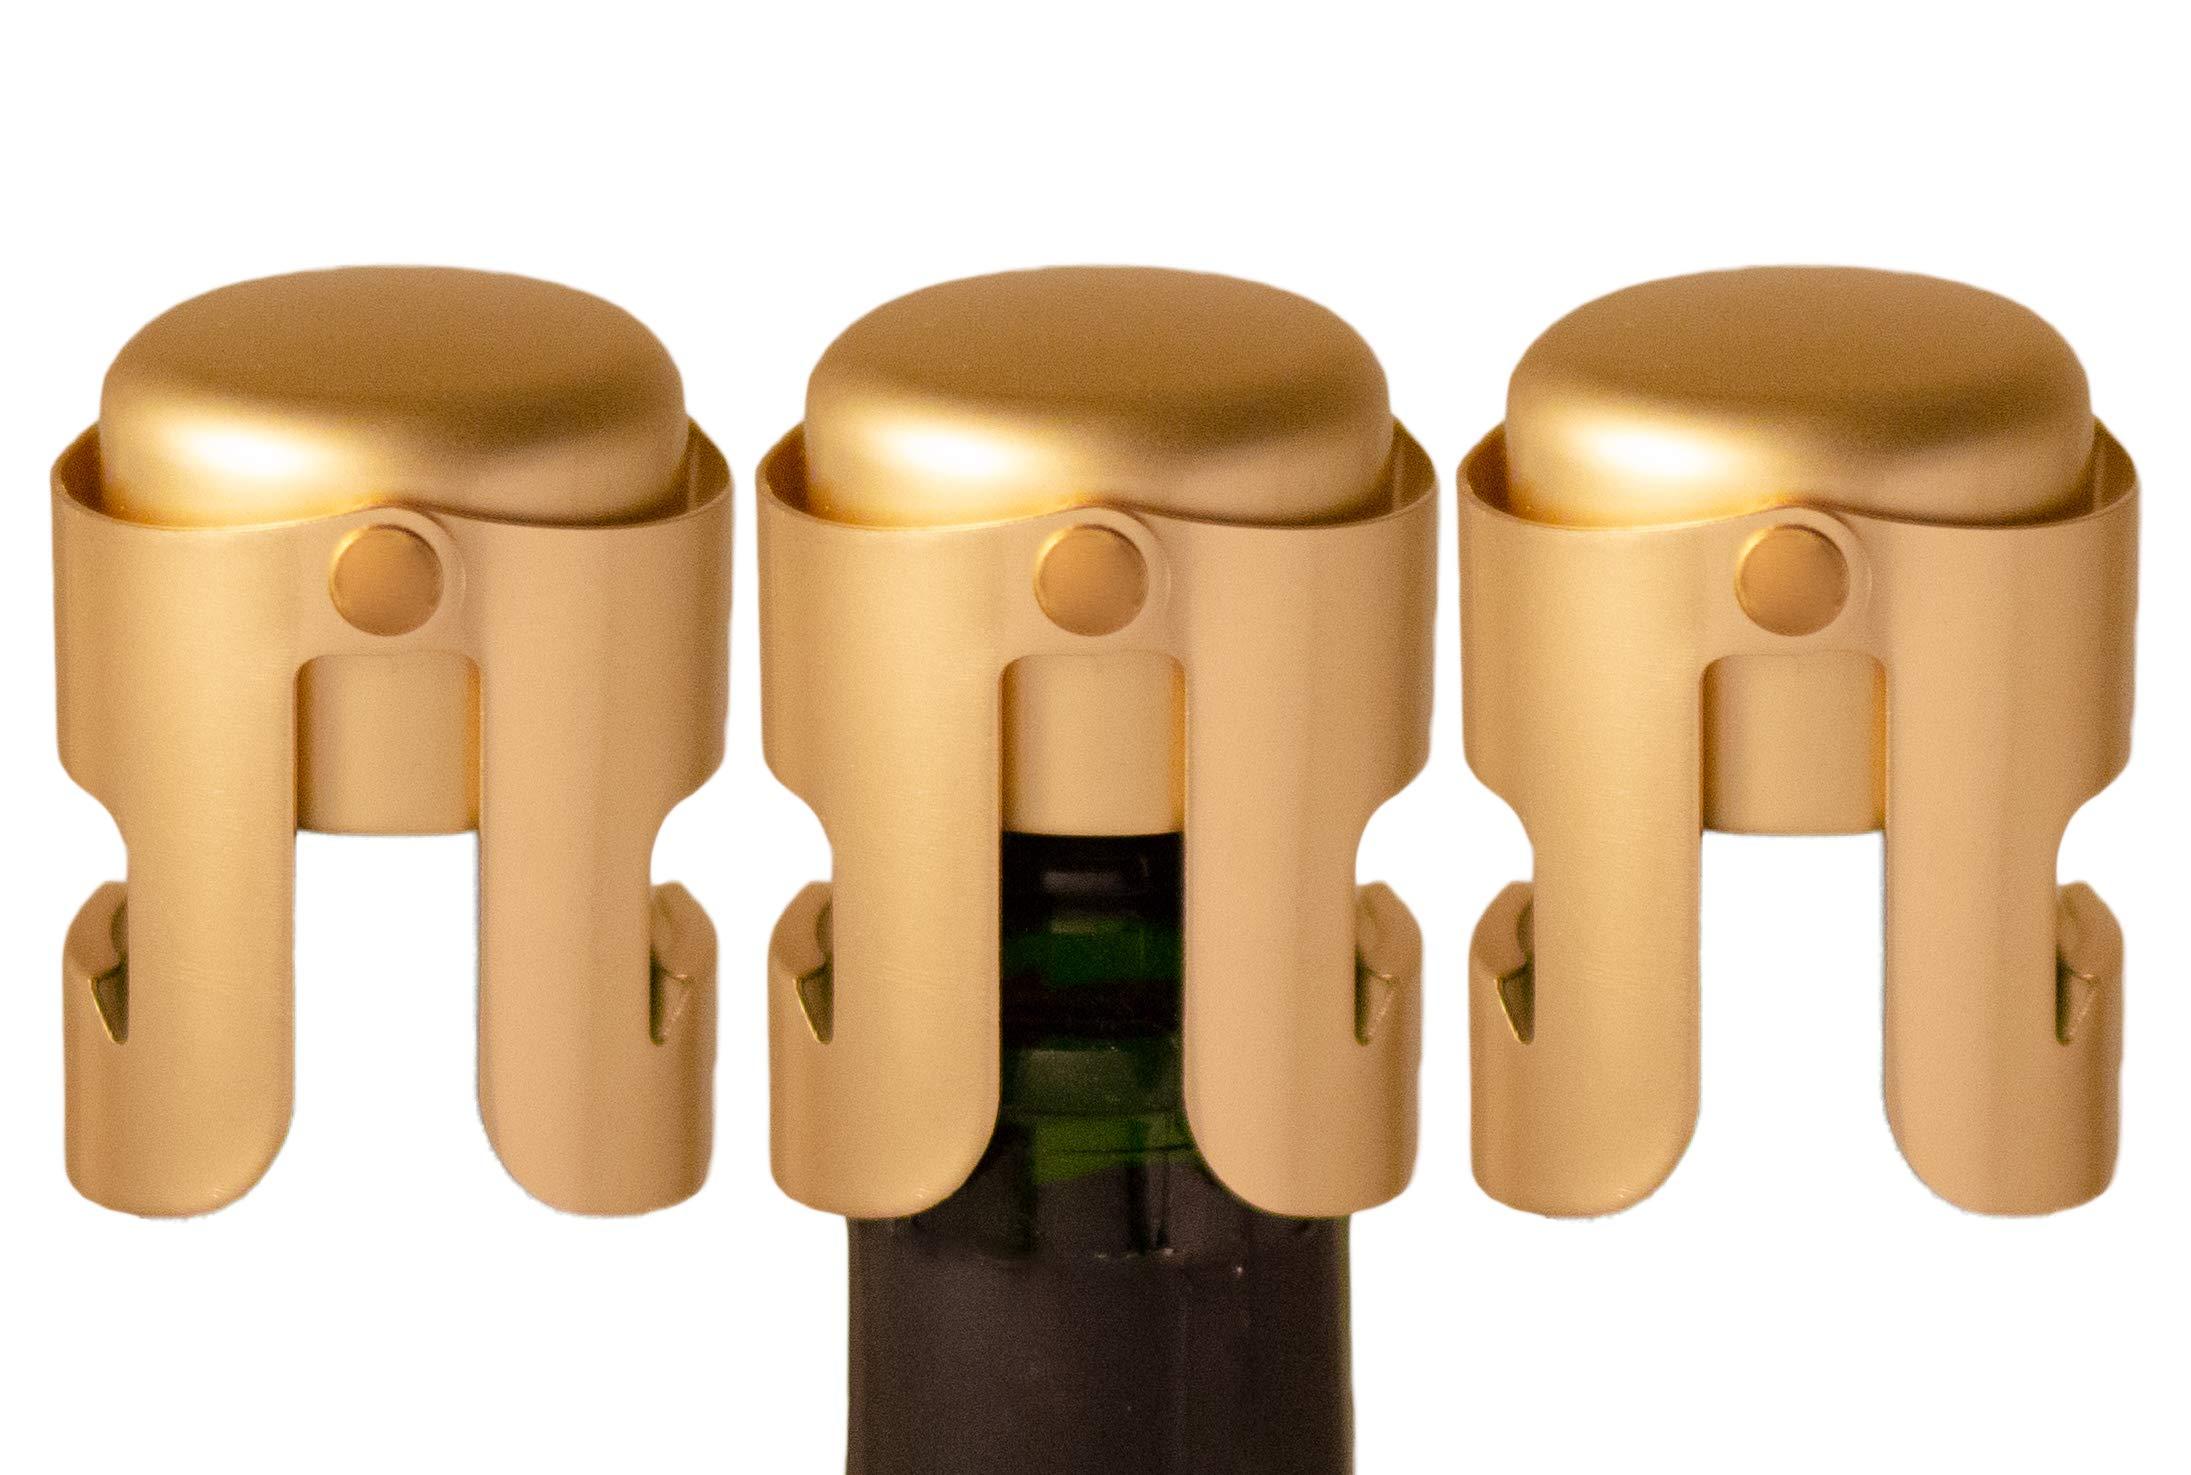 Gold Champagne Stopper, Designed in France, Bottle Sealer for Cava, Prosecco, Sparkling Wine, Gold Plated, No Sharp Edge, Simple Design, No Leaks, No Spills, Passed 13 lbs Pressure Test (Set of 3)